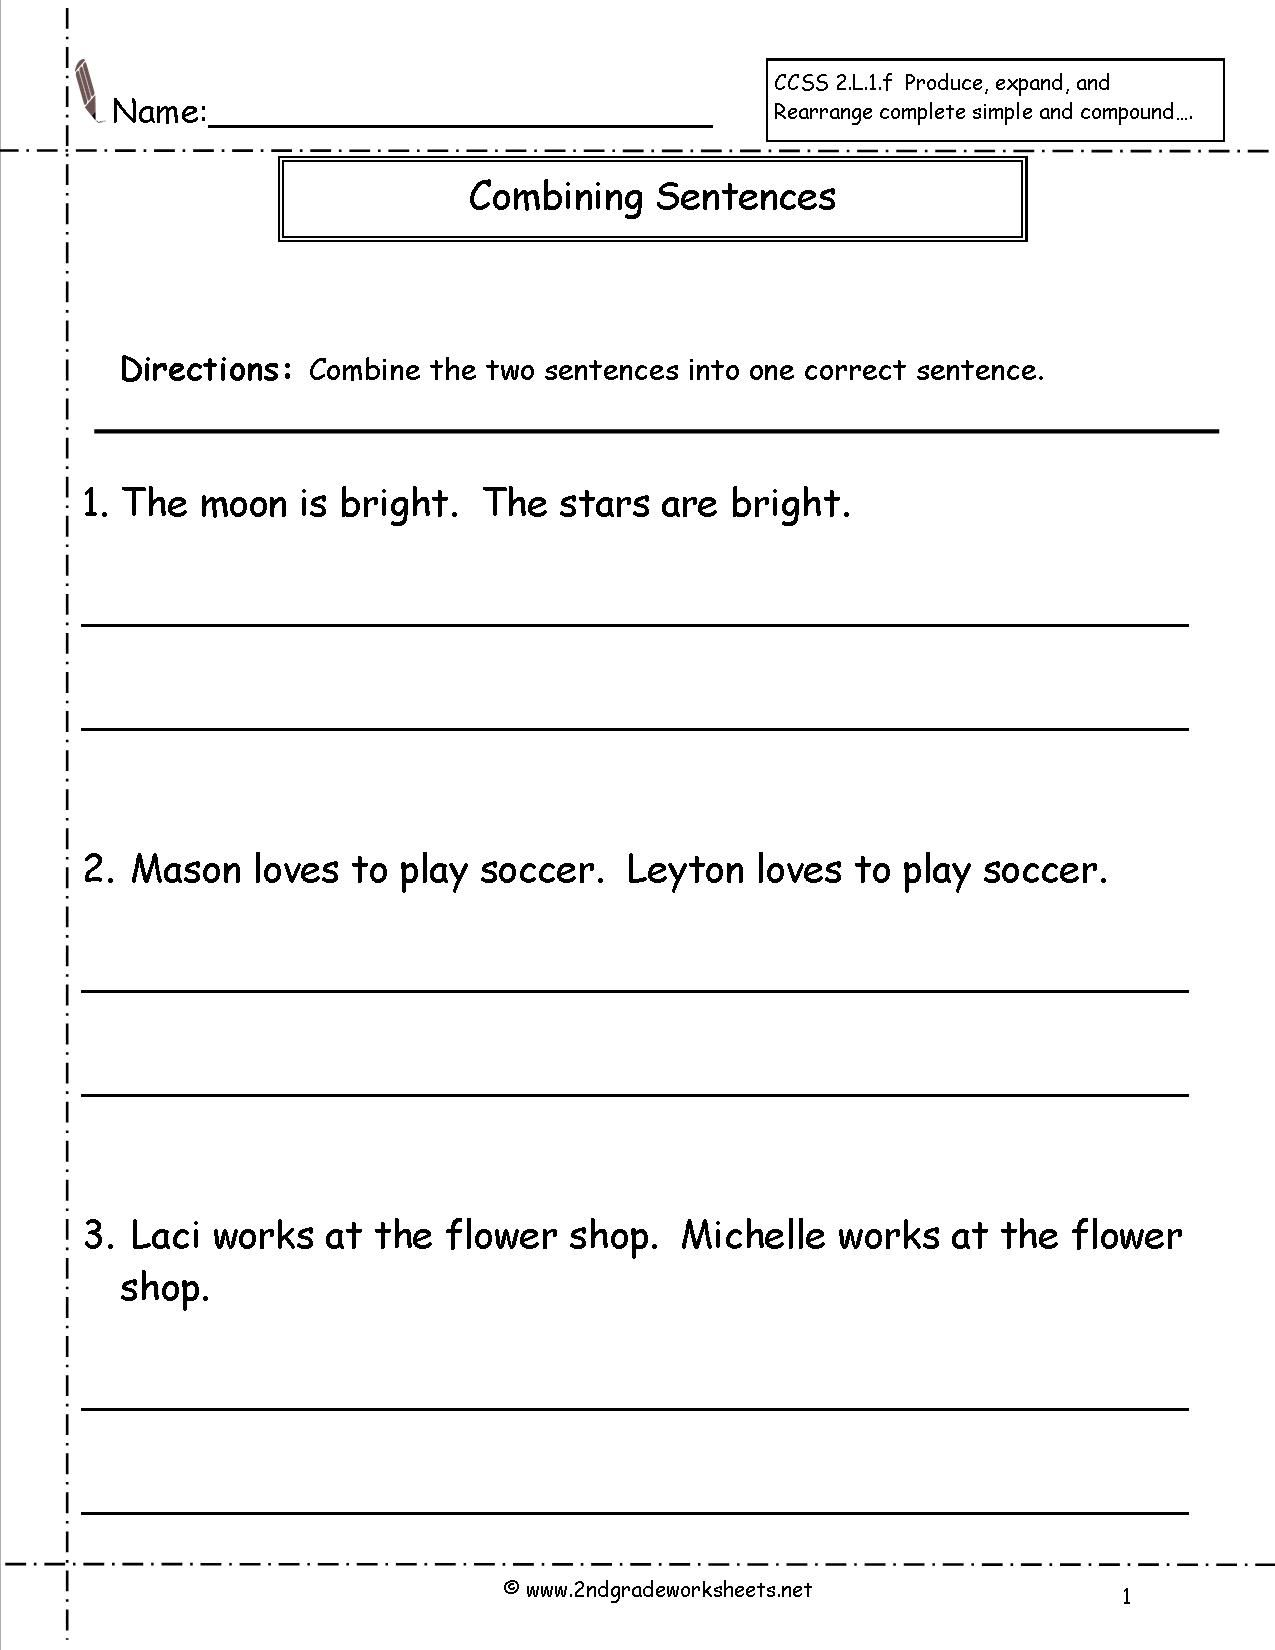 medium resolution of combining sentences worksheet   Combining sentences